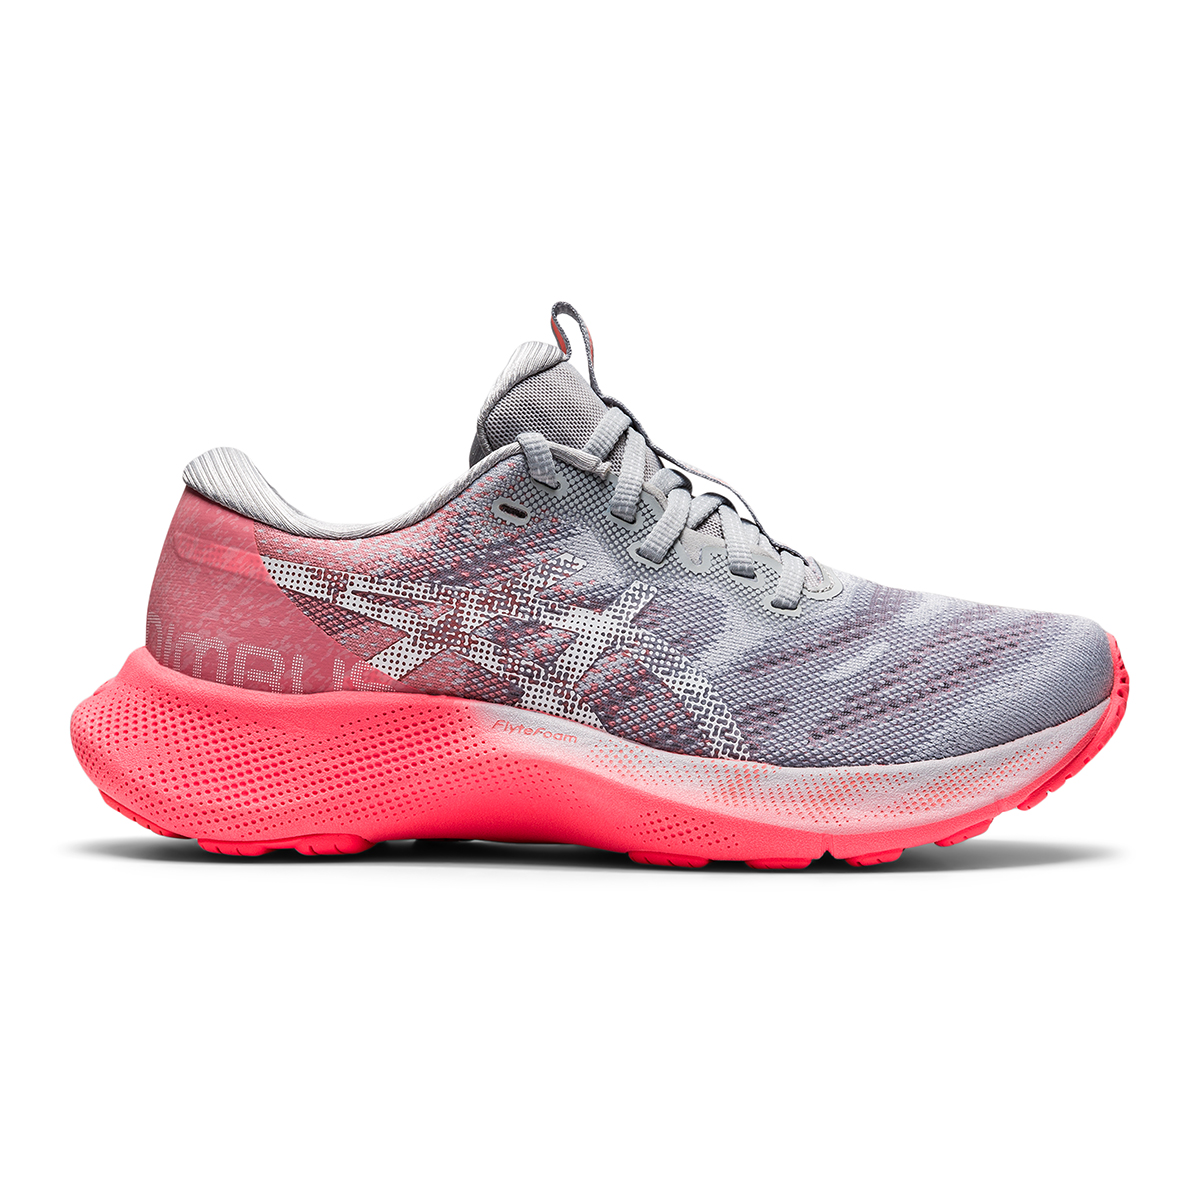 Women's Asics Gel-Nimbus Lite 2 Running Shoe - Color: Blazing Coral  - Size: 5 - Width: Regular, Blazing Coral, large, image 1